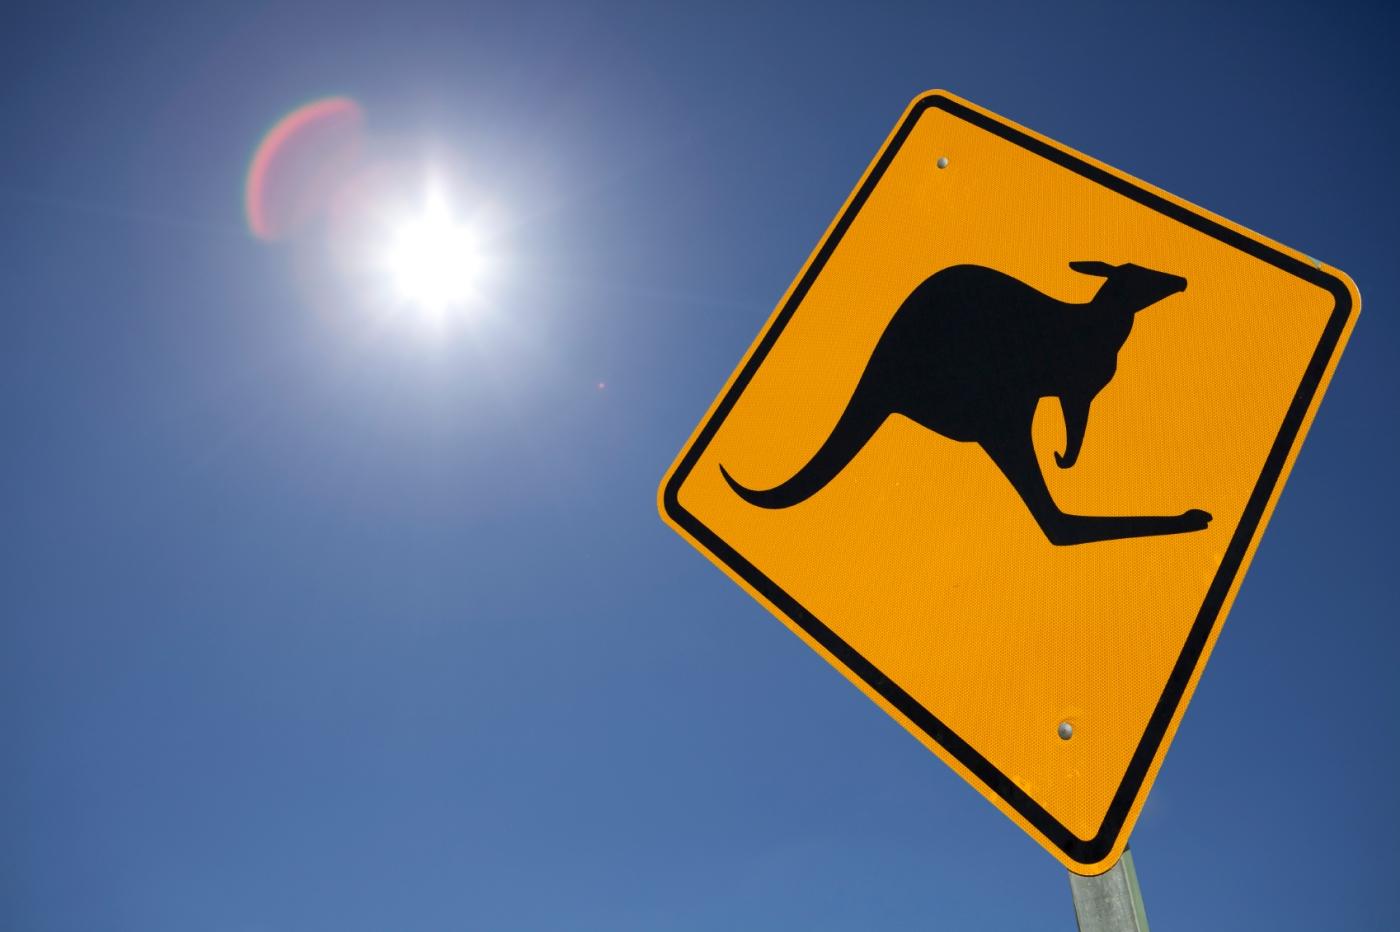 Kangaroo sign in the heat